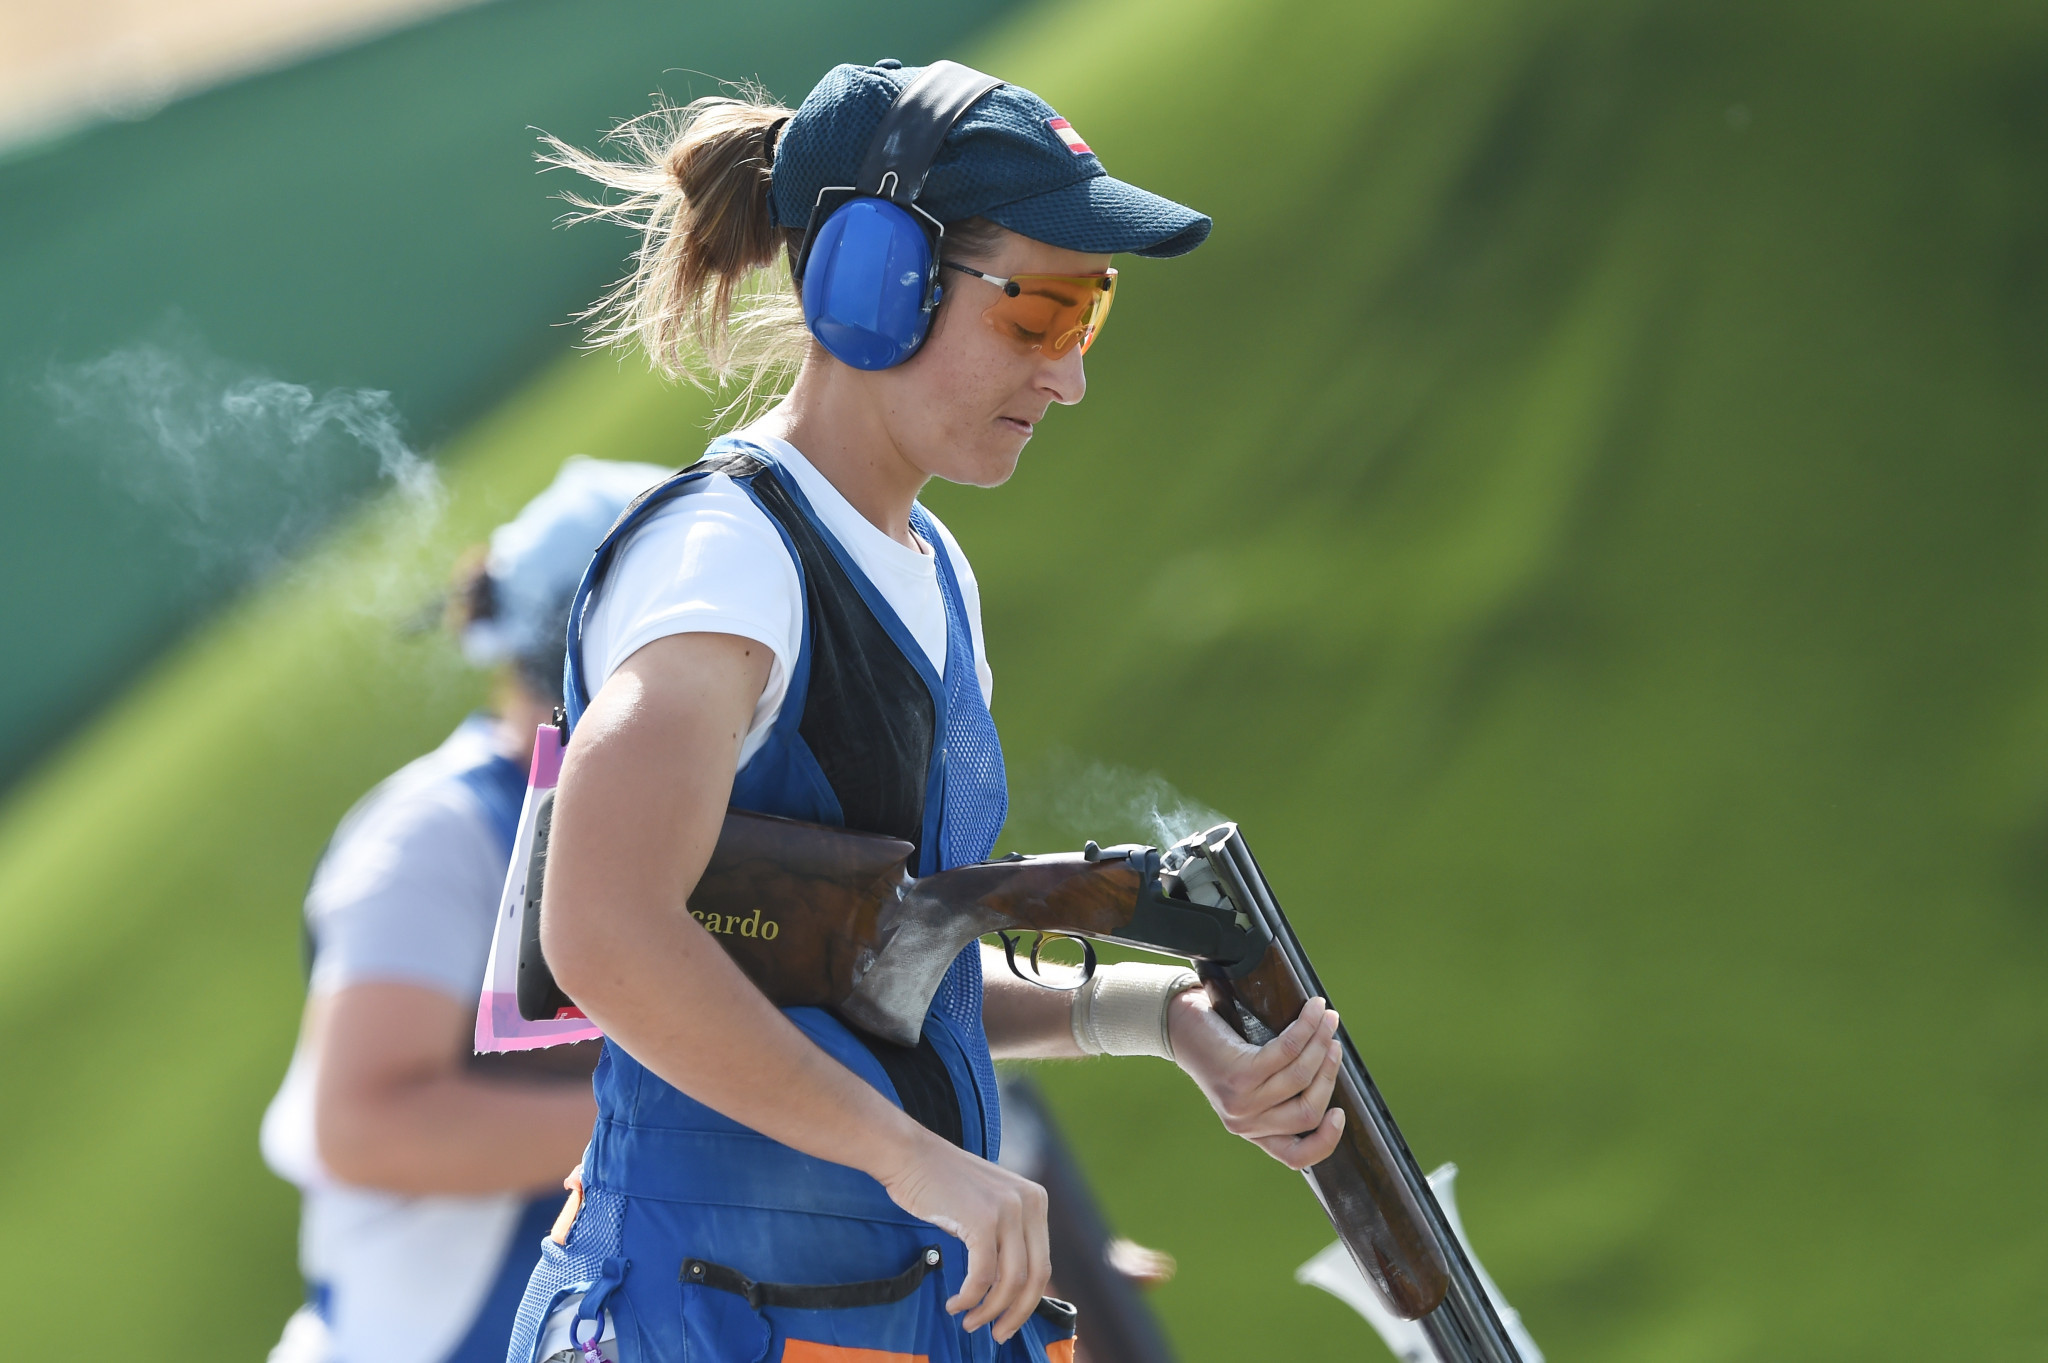 Spain win women's trap team gold at ISSF Shotgun World Cup in Lonato